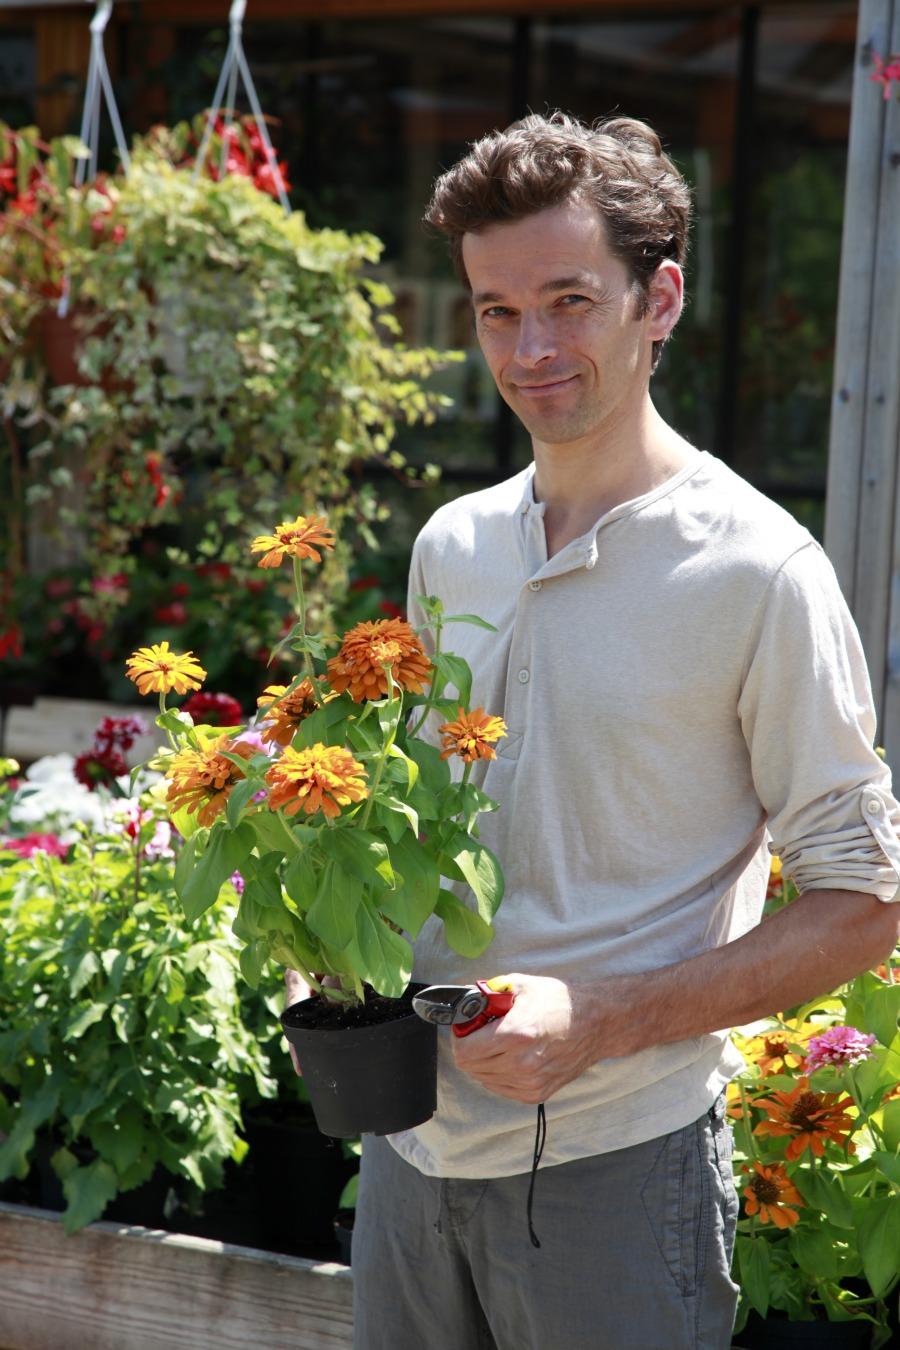 Giardino Zen Giardinieri In Affitto : Il giardino piange su lei arrivano i giardinieri in